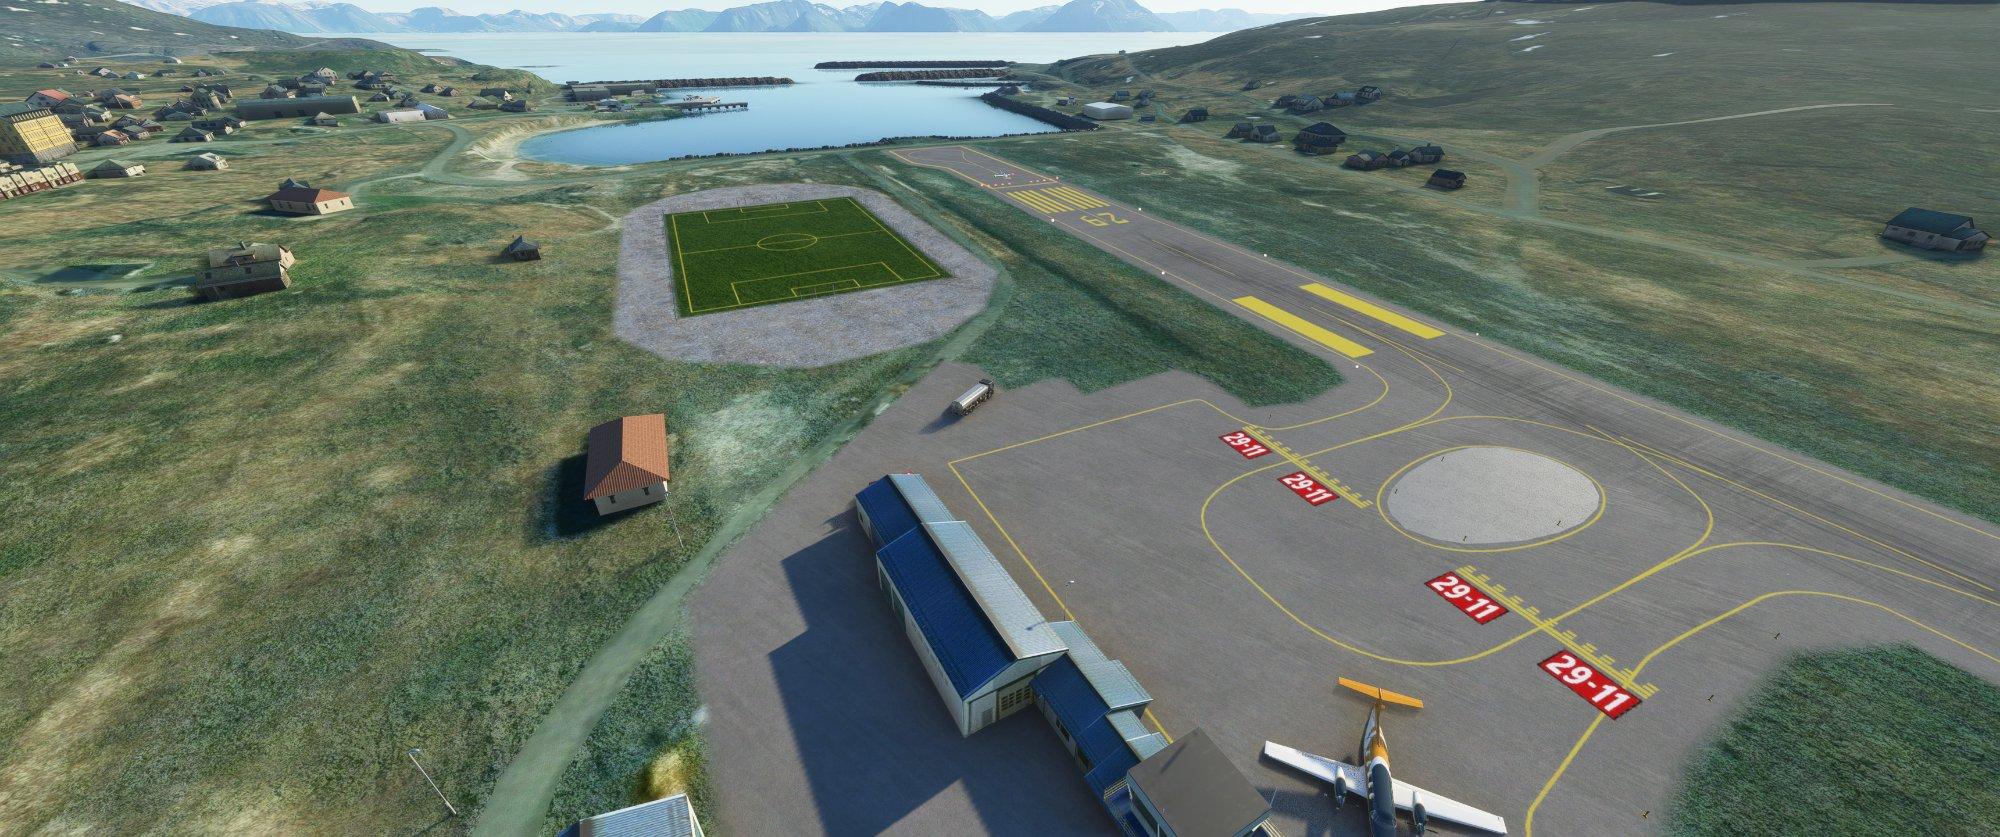 Microsoft Flight Simulator Screenshot 2020.11.20 - 12.55.42.23.jpg